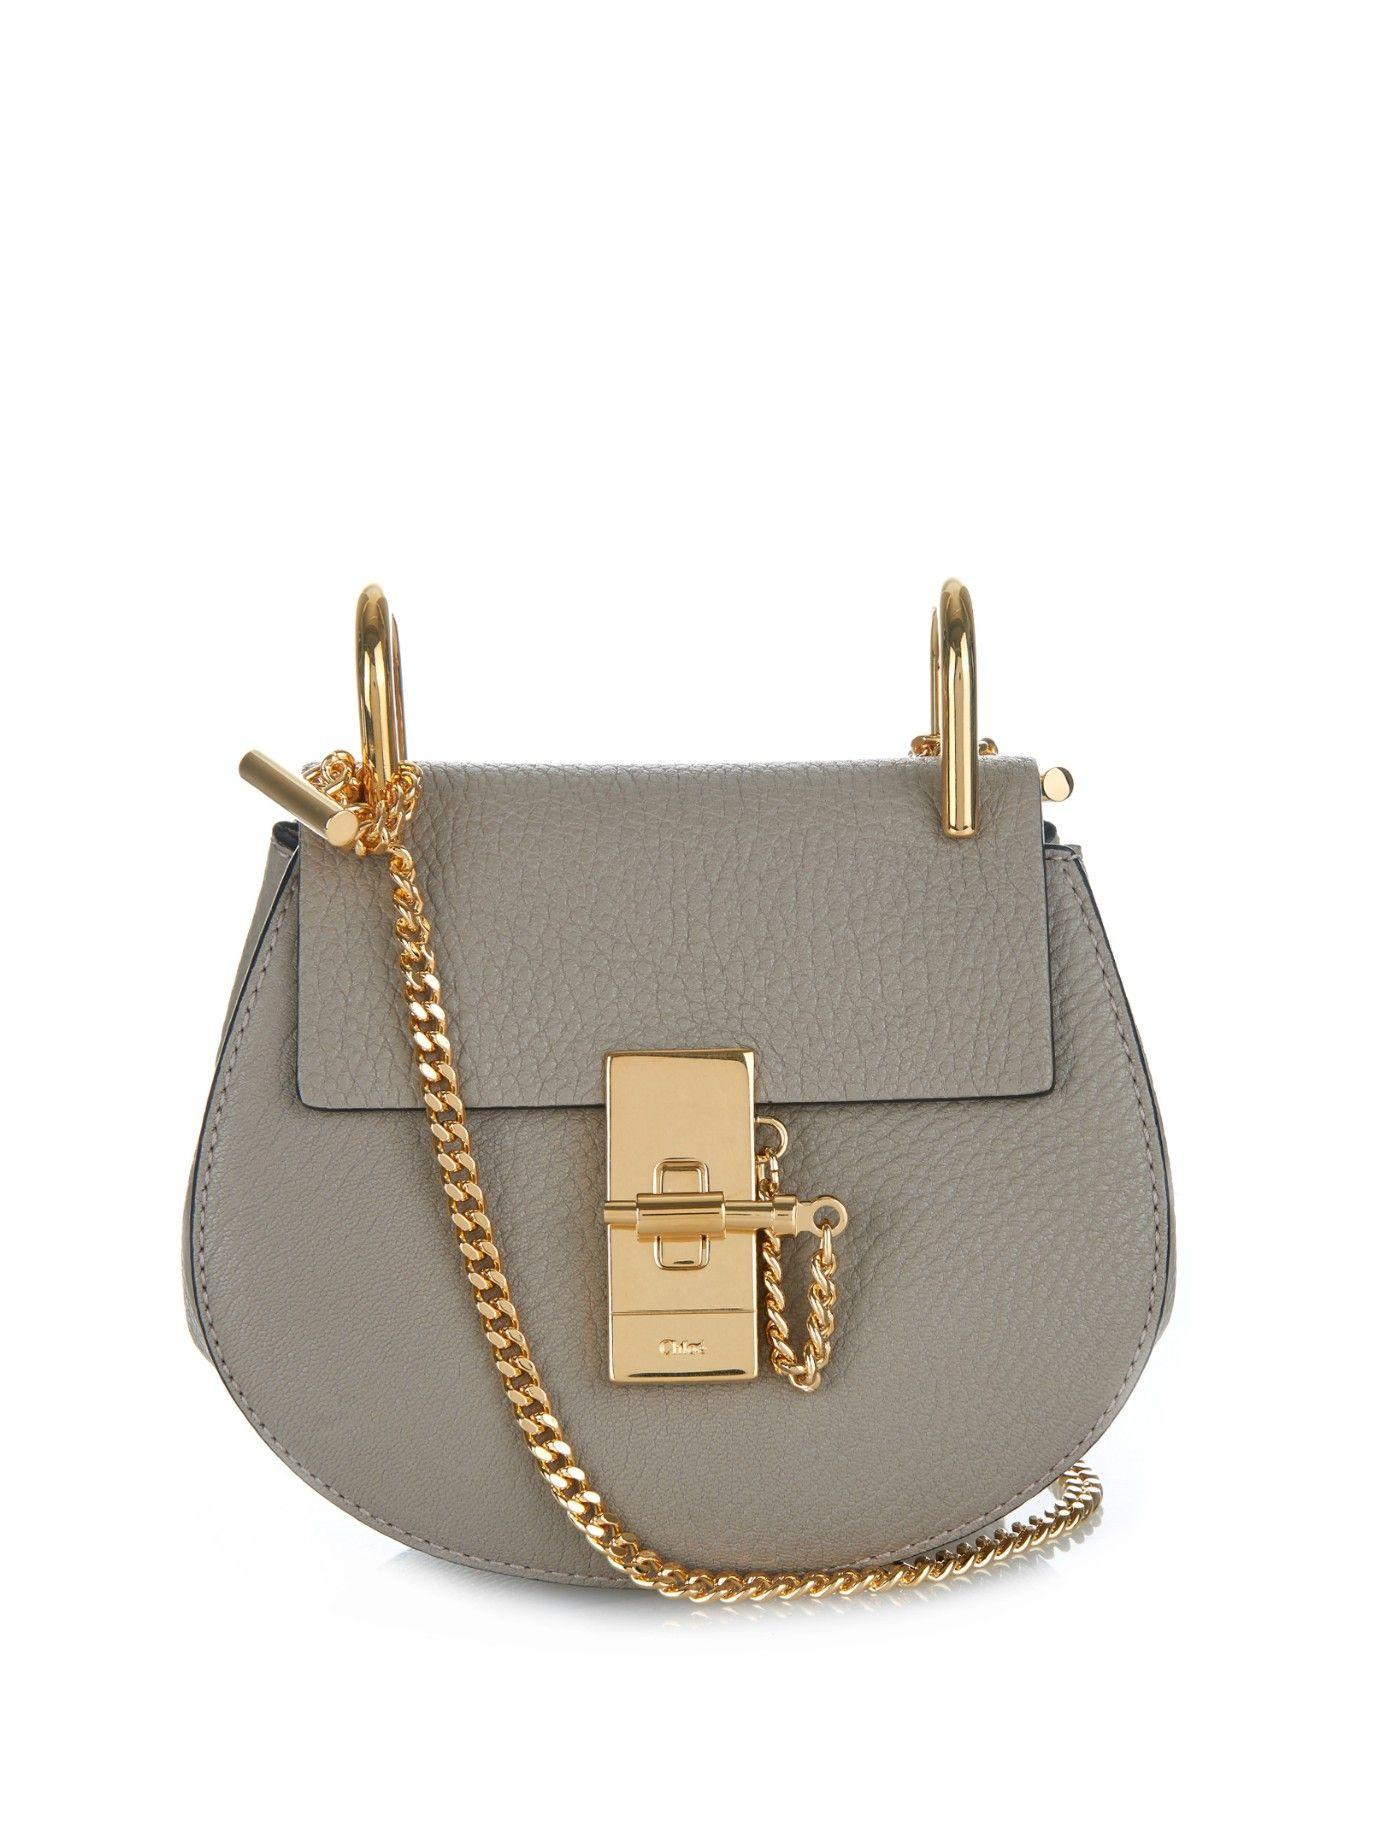 Drew nano leather shoulder bag  6522e9021